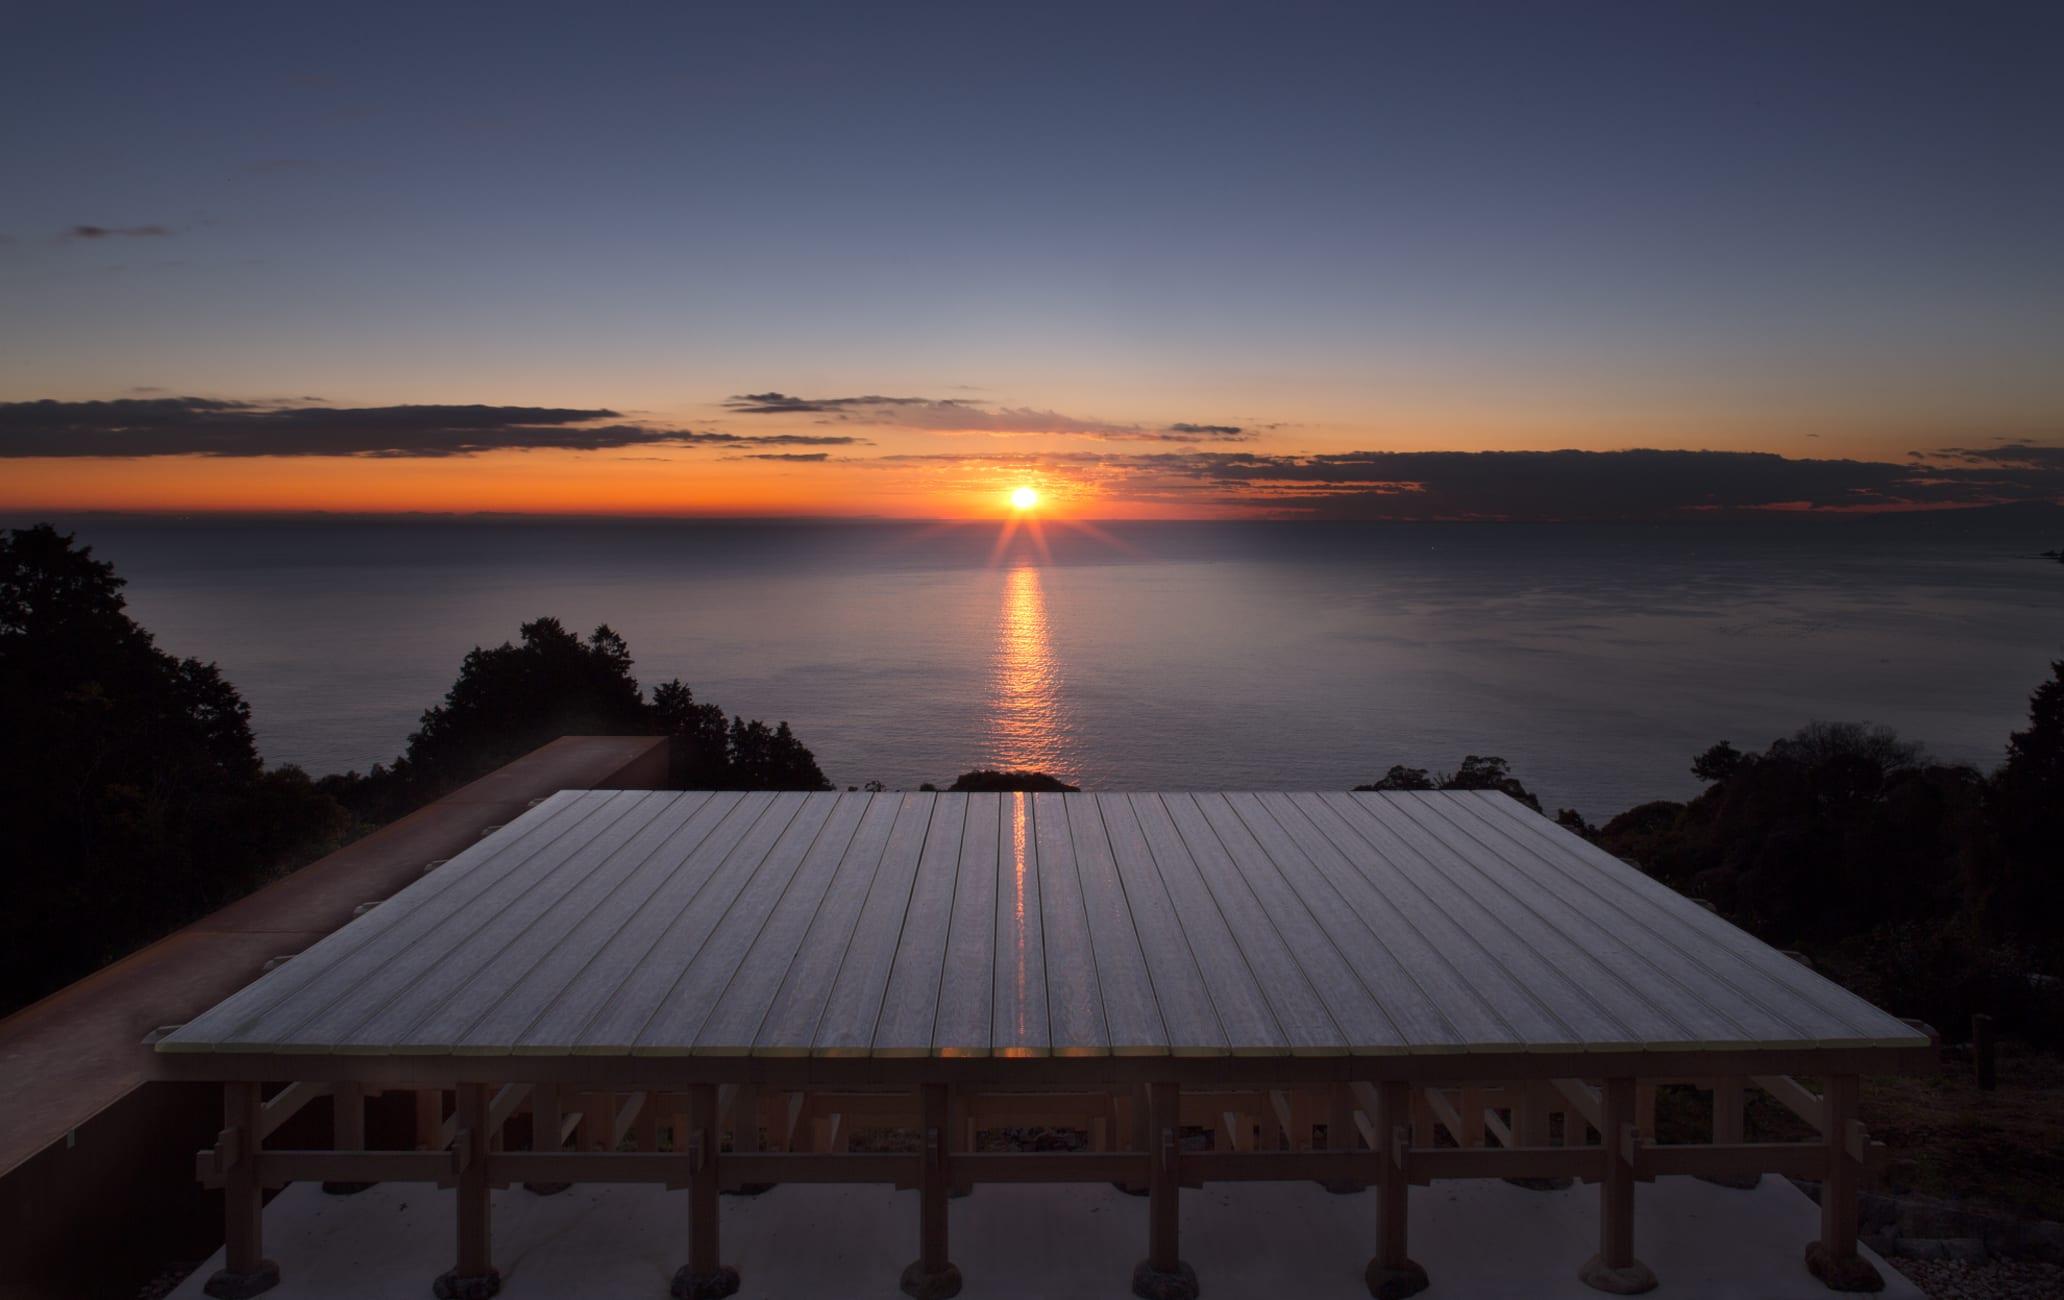 Enoura Observatory